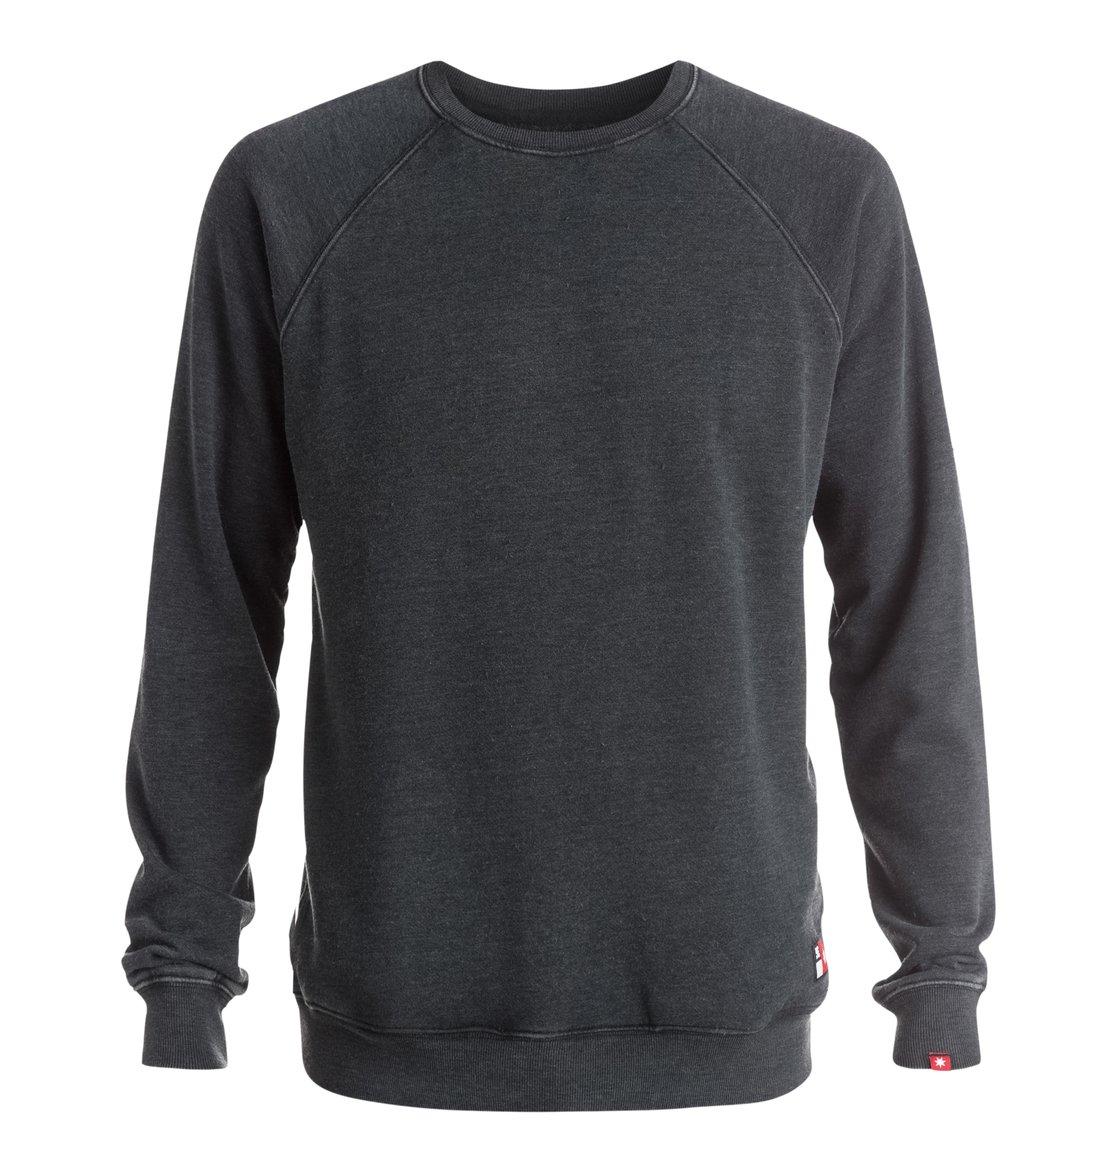 Dcshoes Мужской свитшот Core Crew Core Crew Sweatshirt